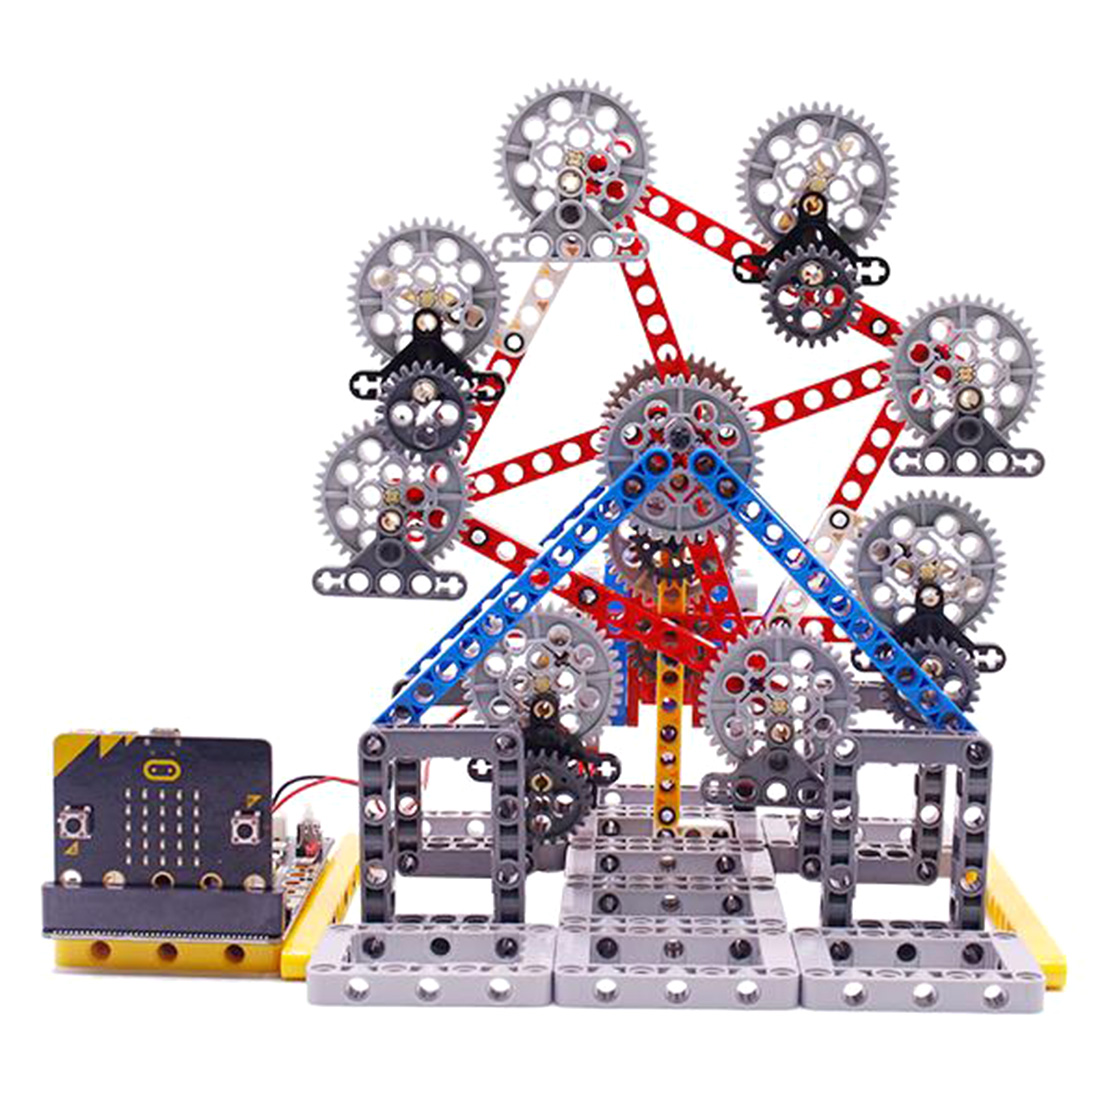 MODIKER 2019 New High Tech Toys For Micro:bit Programmable Building Block DIY Smart Ferris Wheel Kit Children Learning